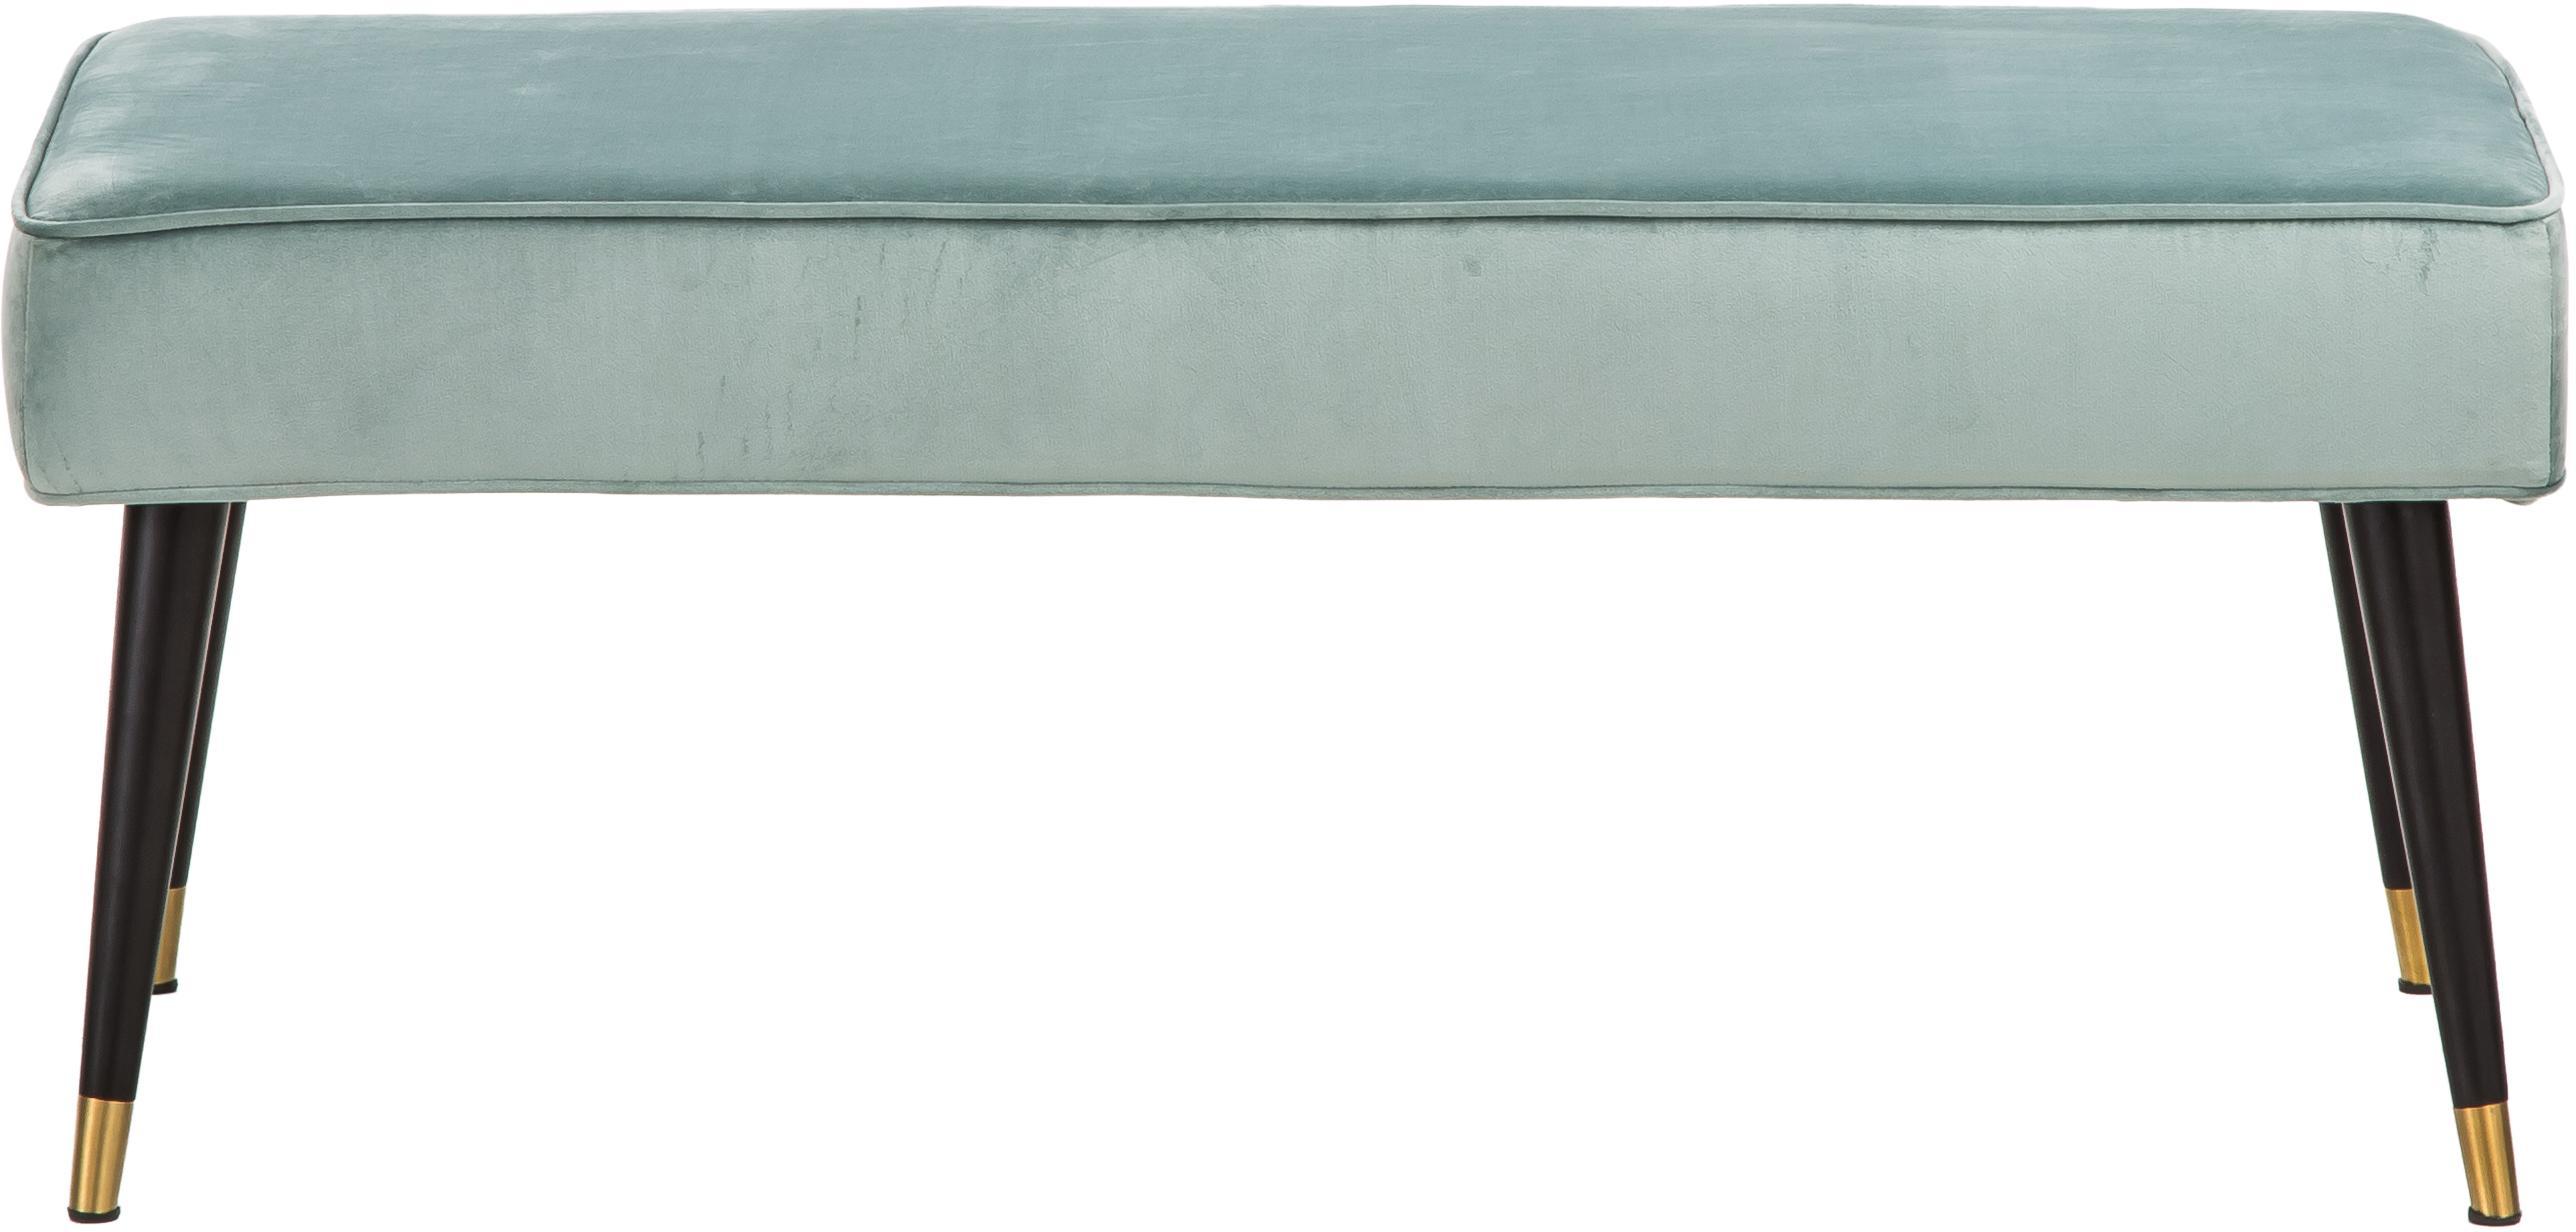 Samt-Sitzbank Beverly, Bezug: Samt (Polyester) 50.000 S, Gestell: Eukalyptusholz, Beine: Metall, pulverbeschichtet, Türkis, B 110 x H 46 cm